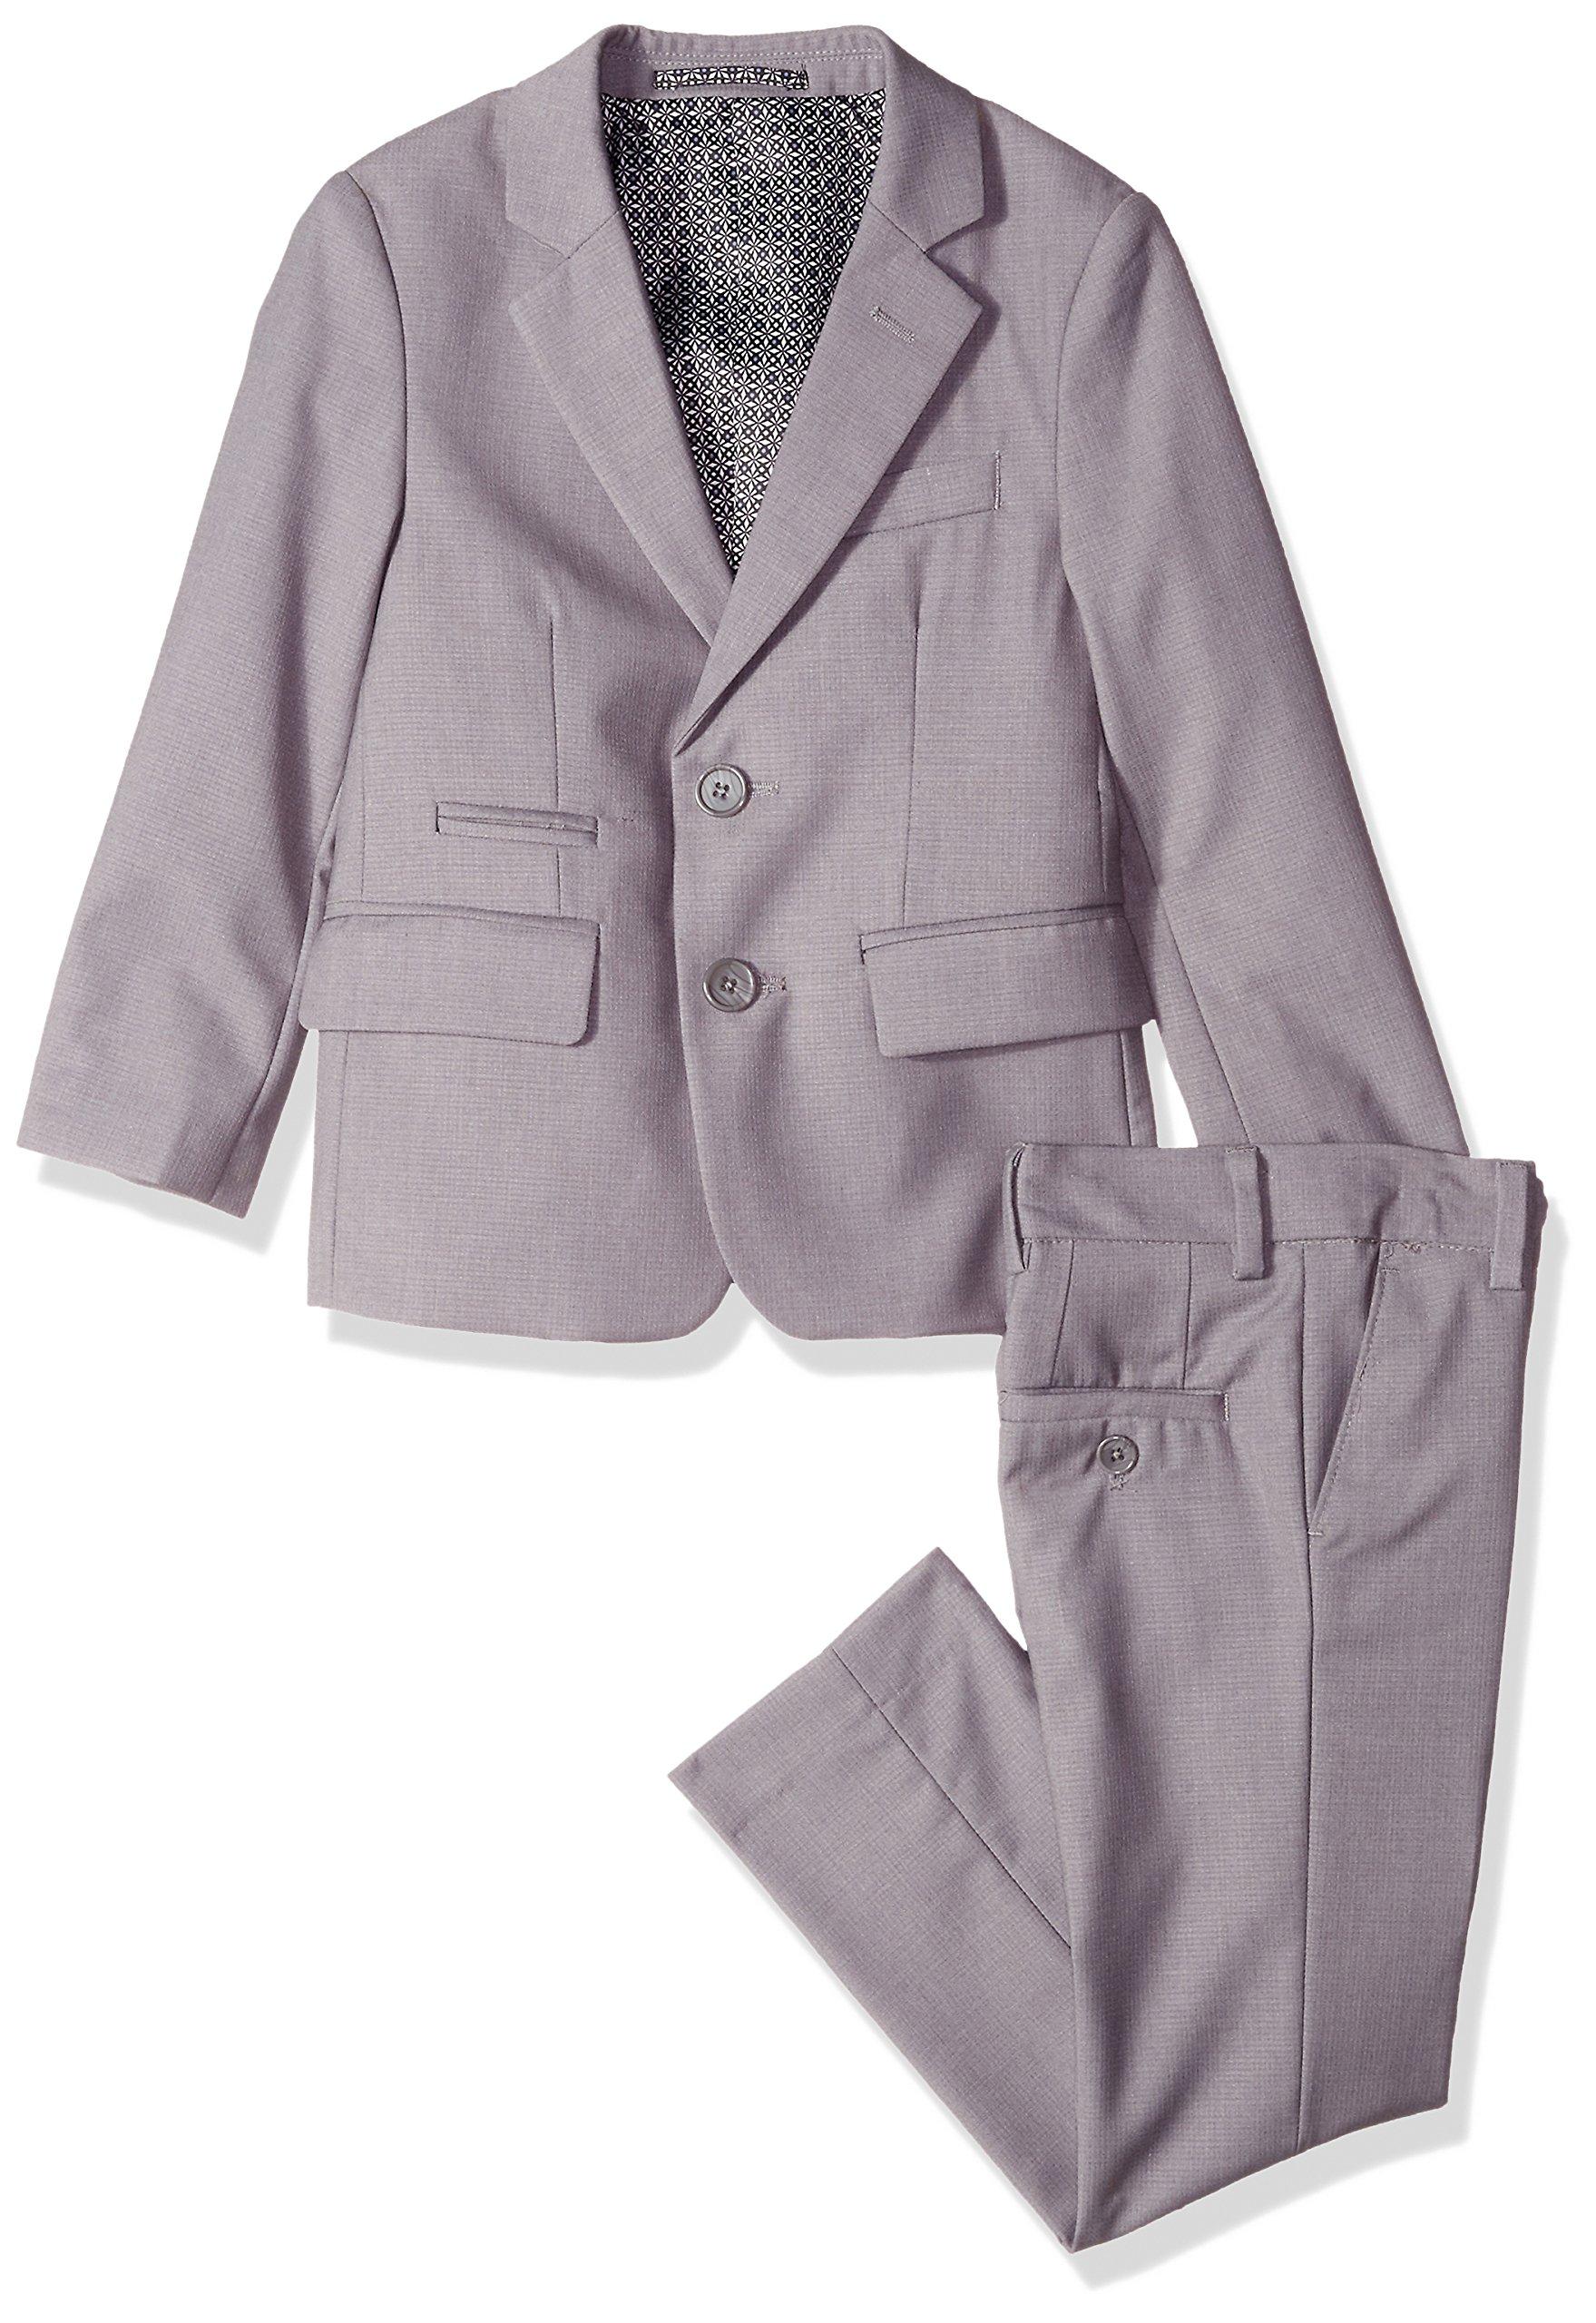 Isaac Mizrahi Big Boys' Textured 2pc Slim Fit Solid Suit, Gray, 12